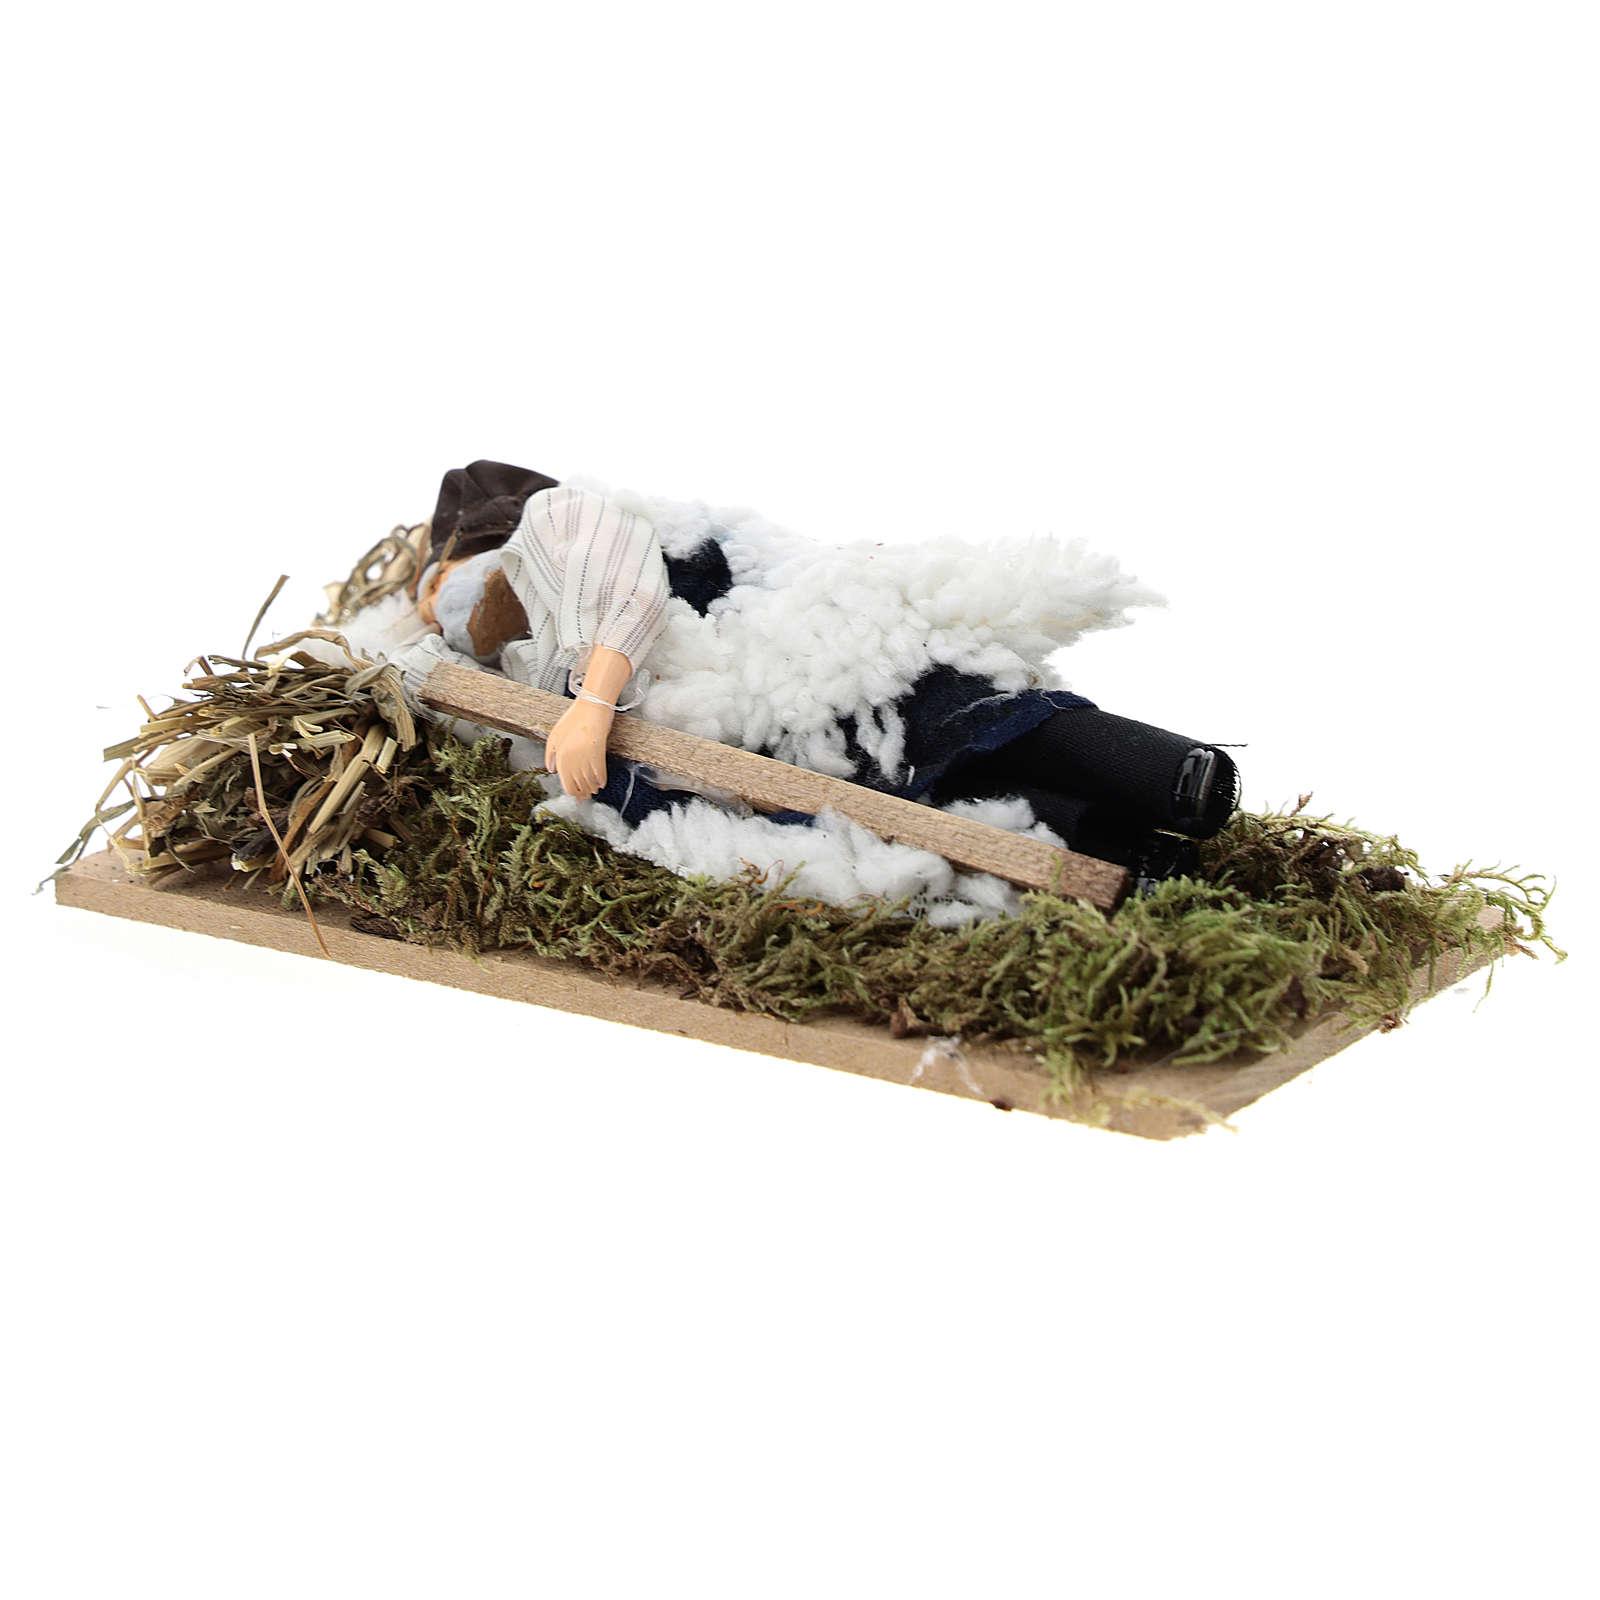 Sleeping man for Nativity scene of 12 cm in terracotta and plastic 3